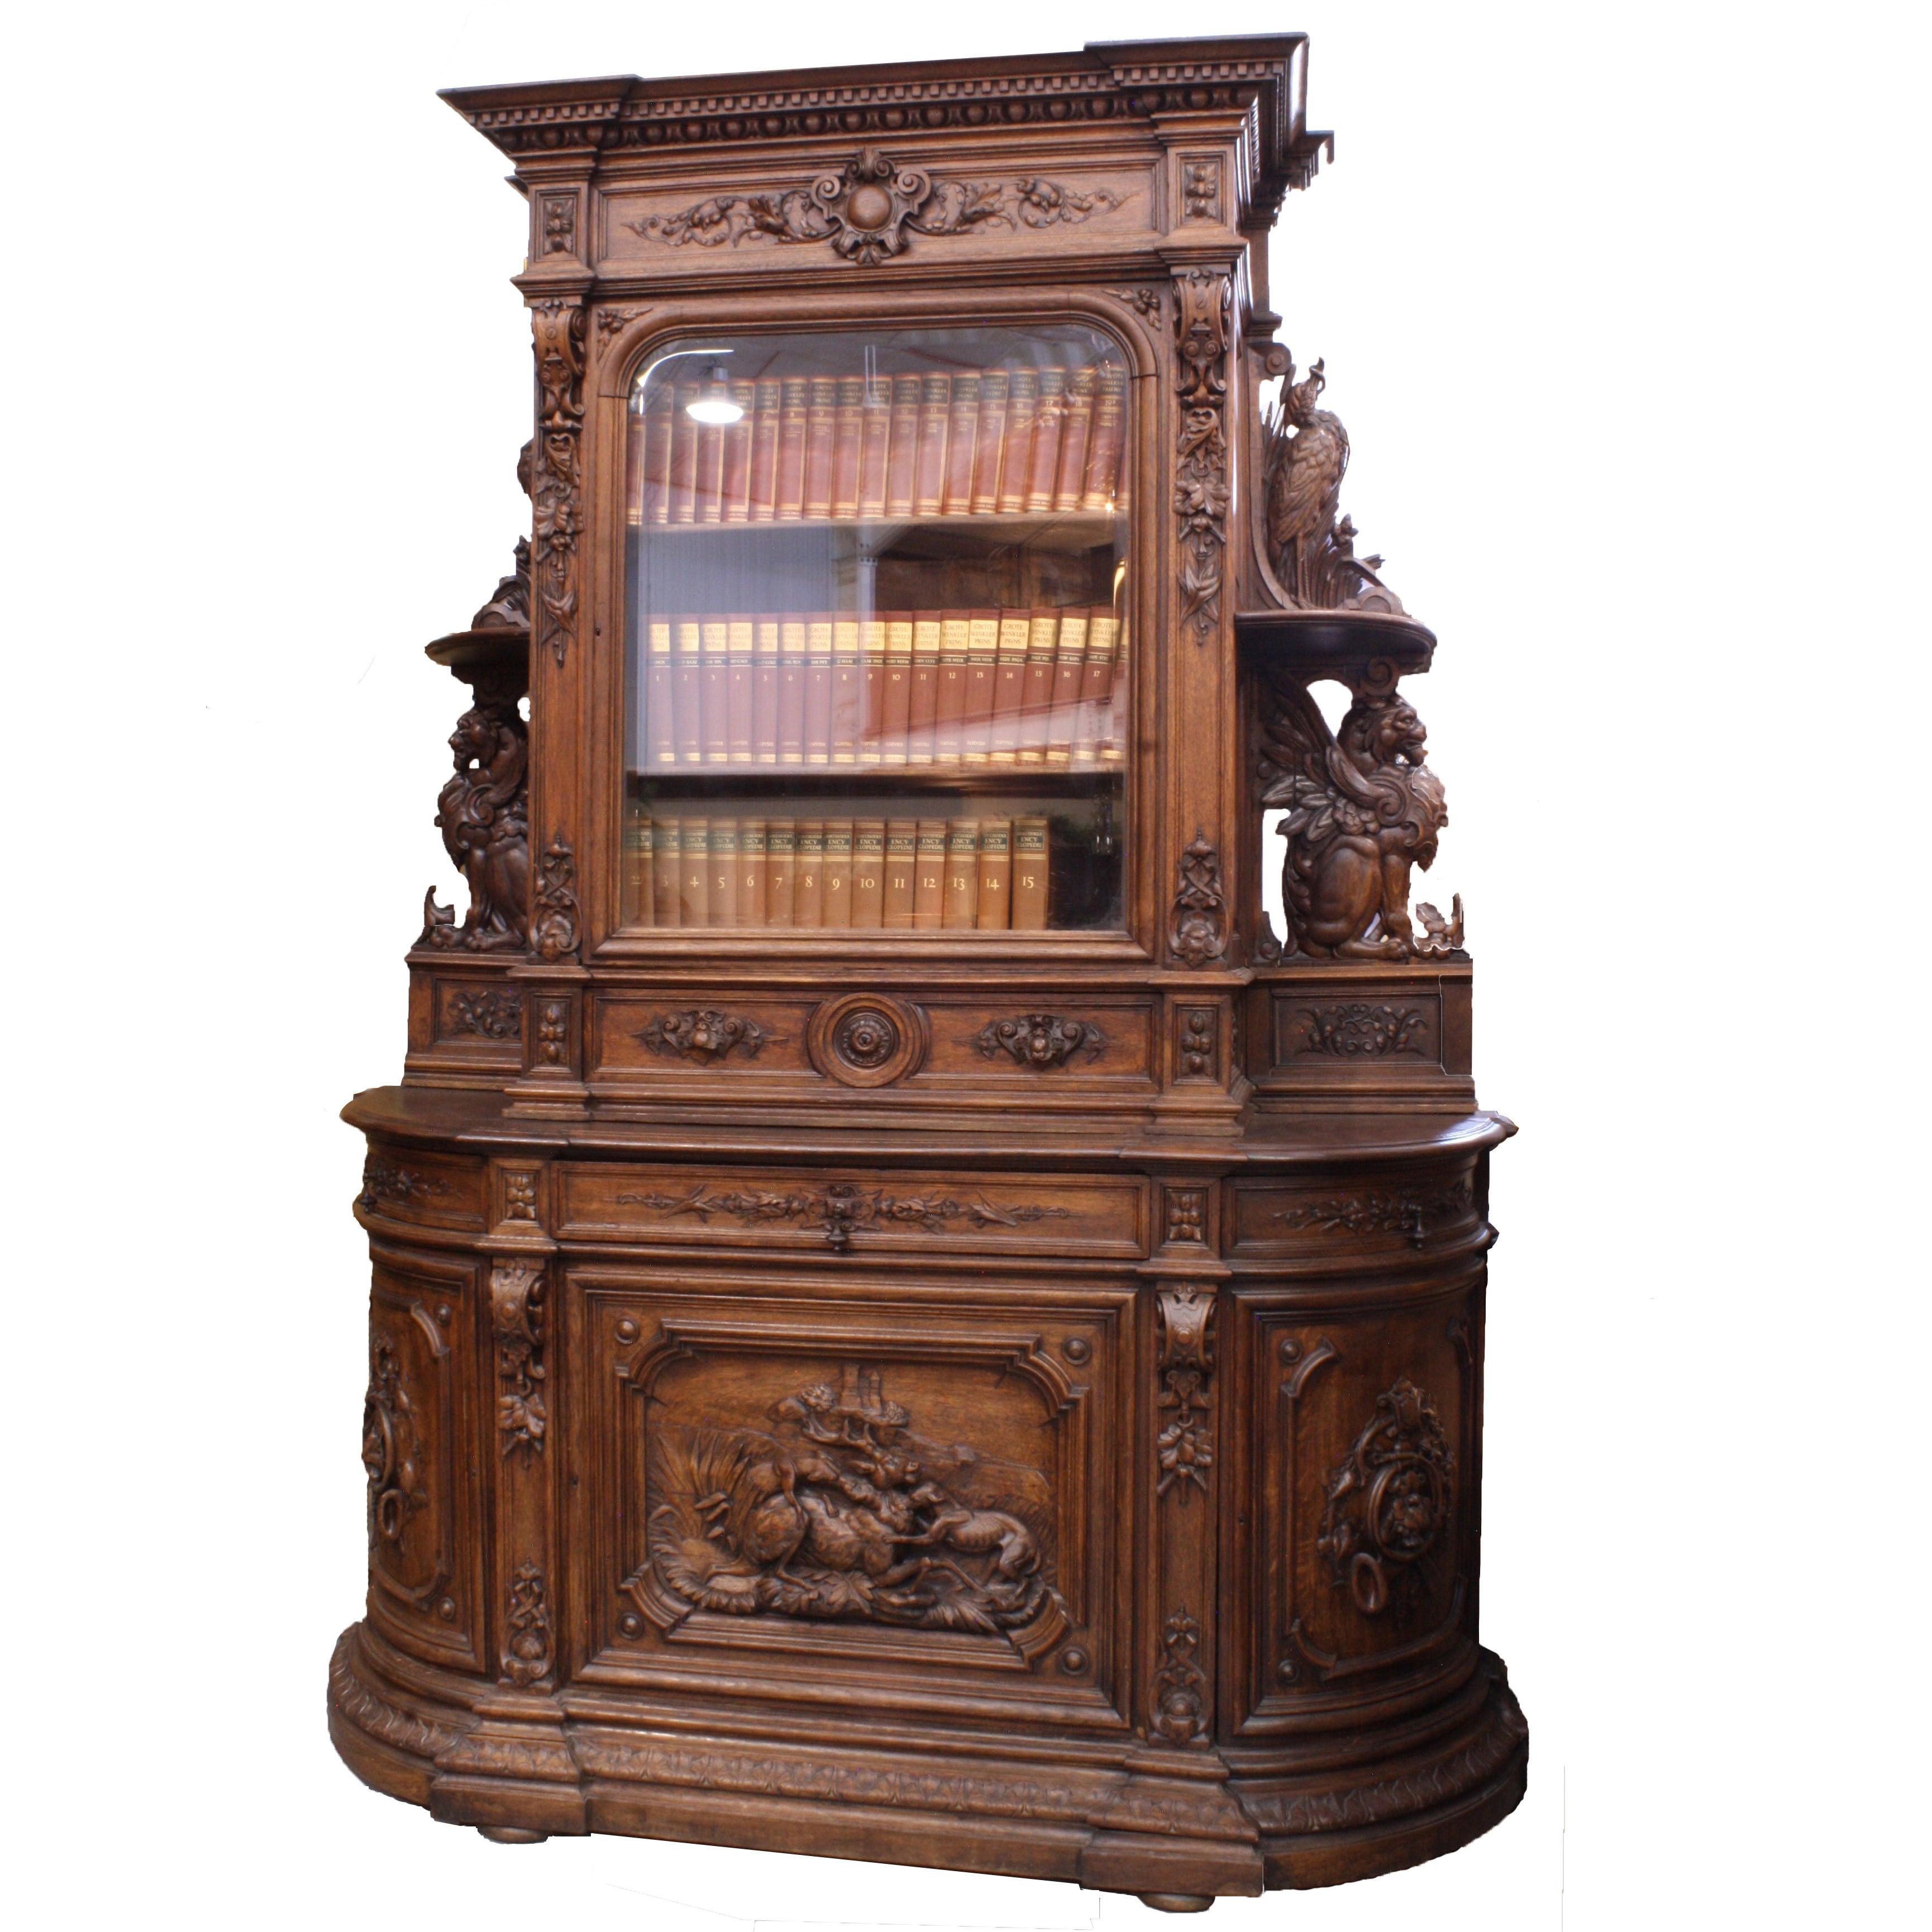 French Hunt Cabinet and Bookshelf, circa 1880